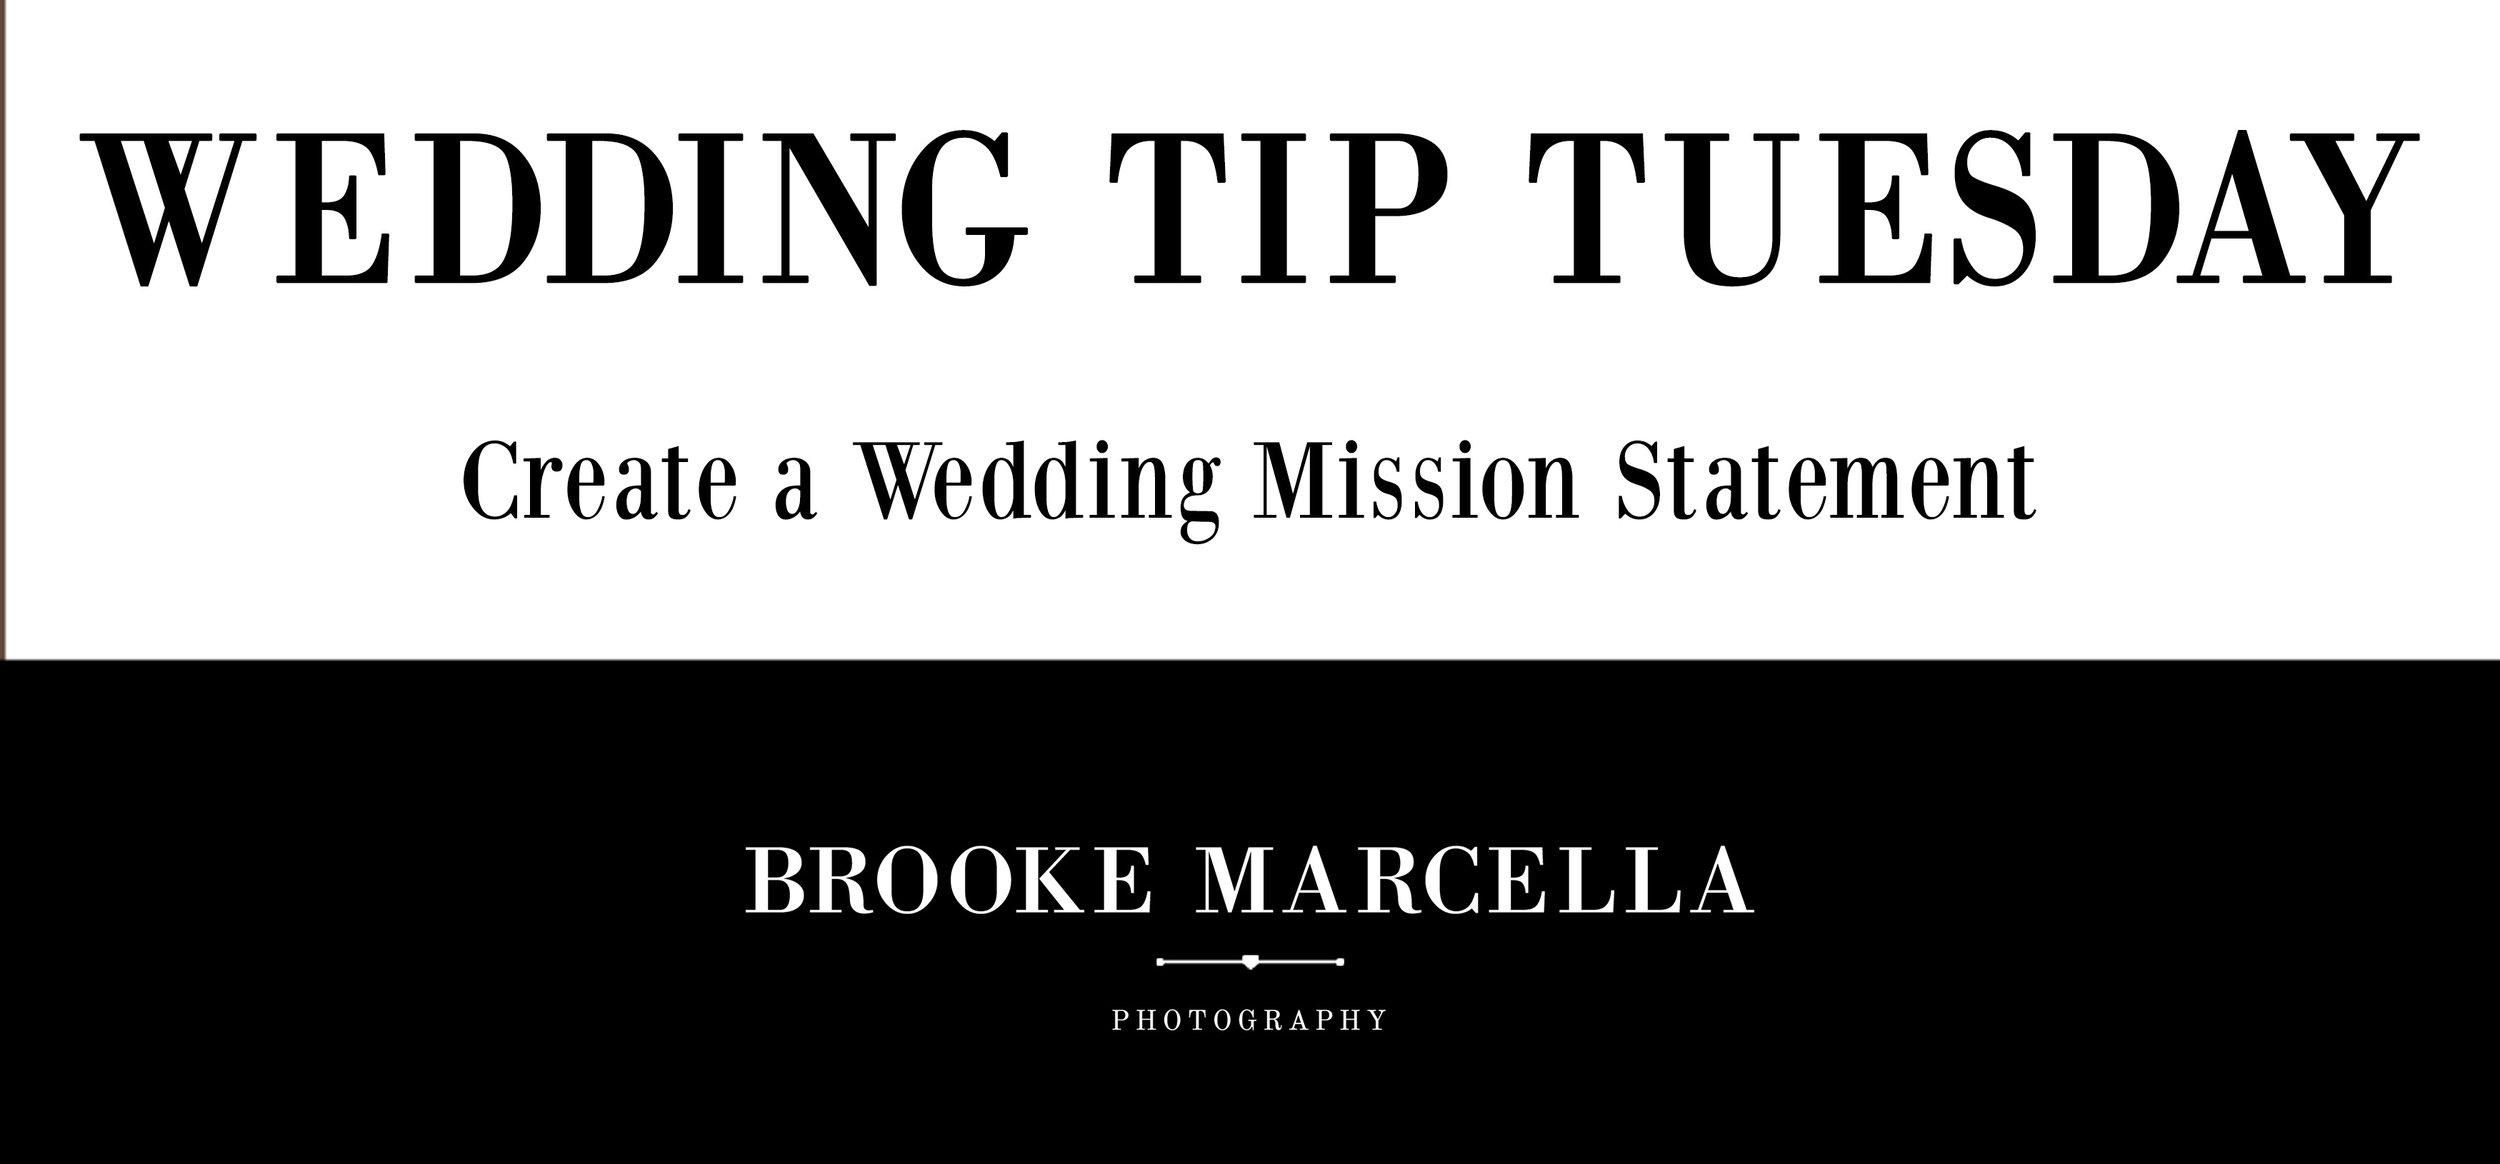 WeddingTipTuesday-MissionStatement.jpg